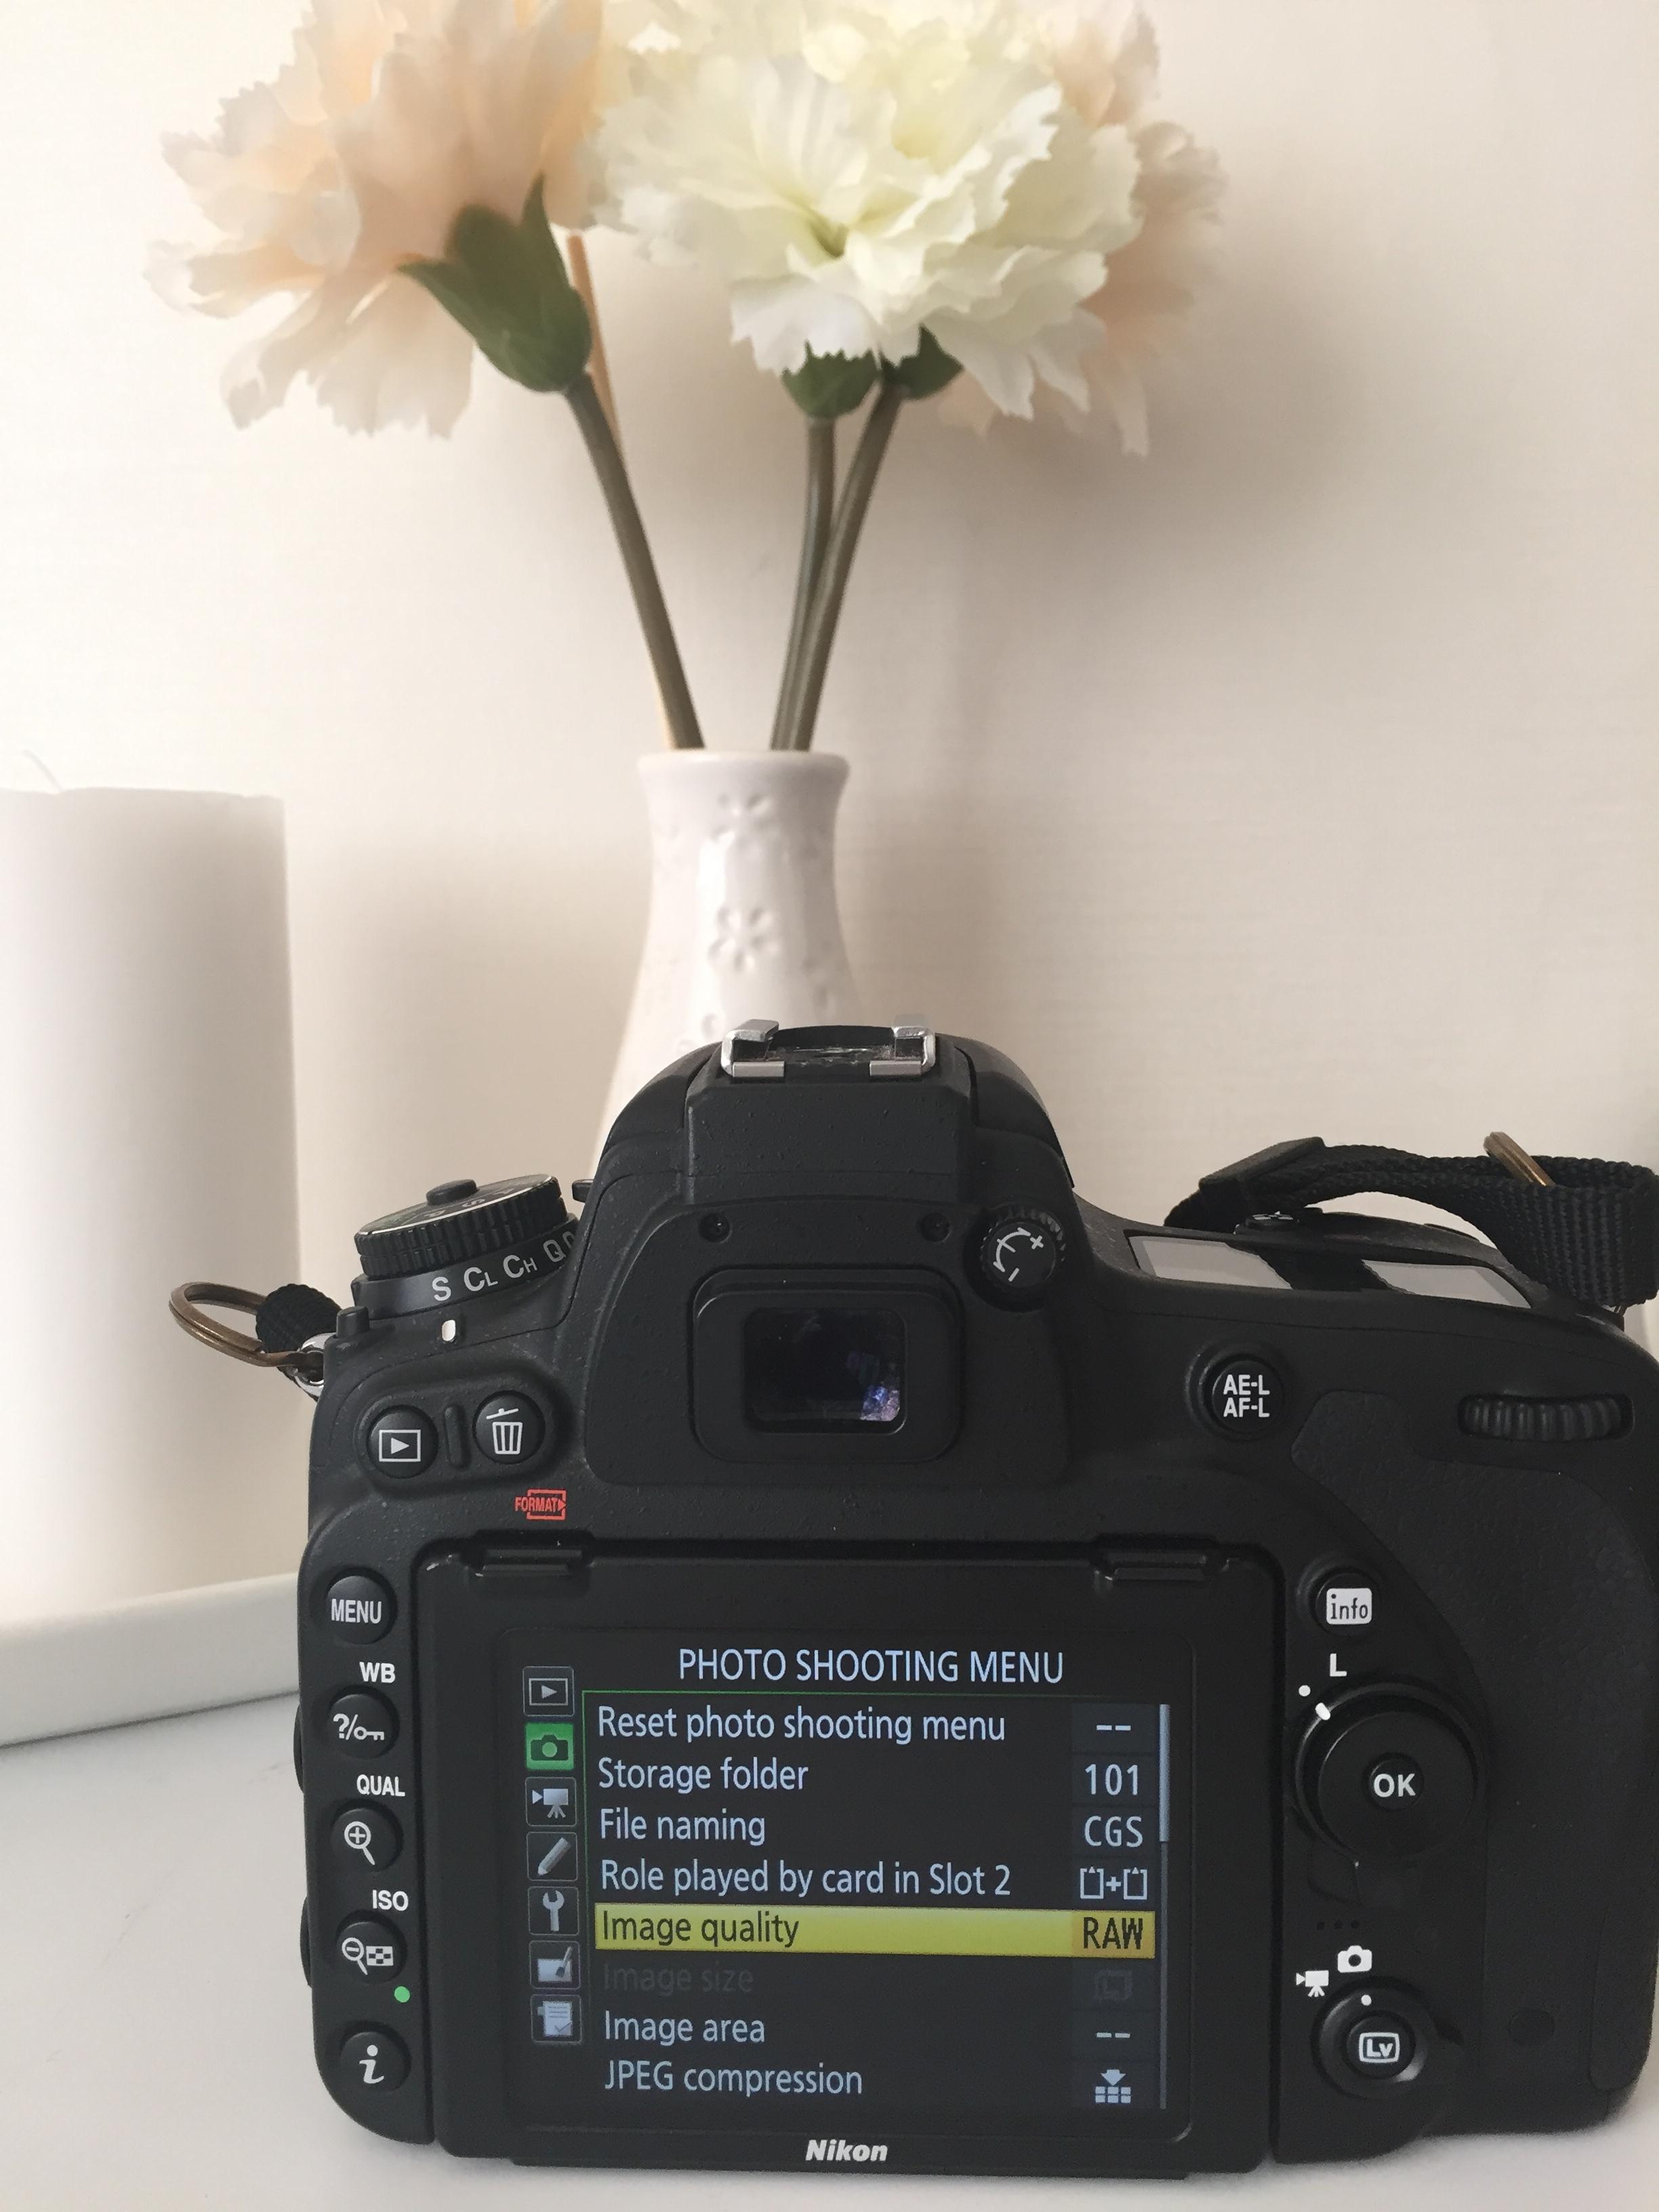 Setting up image quality on Nikon